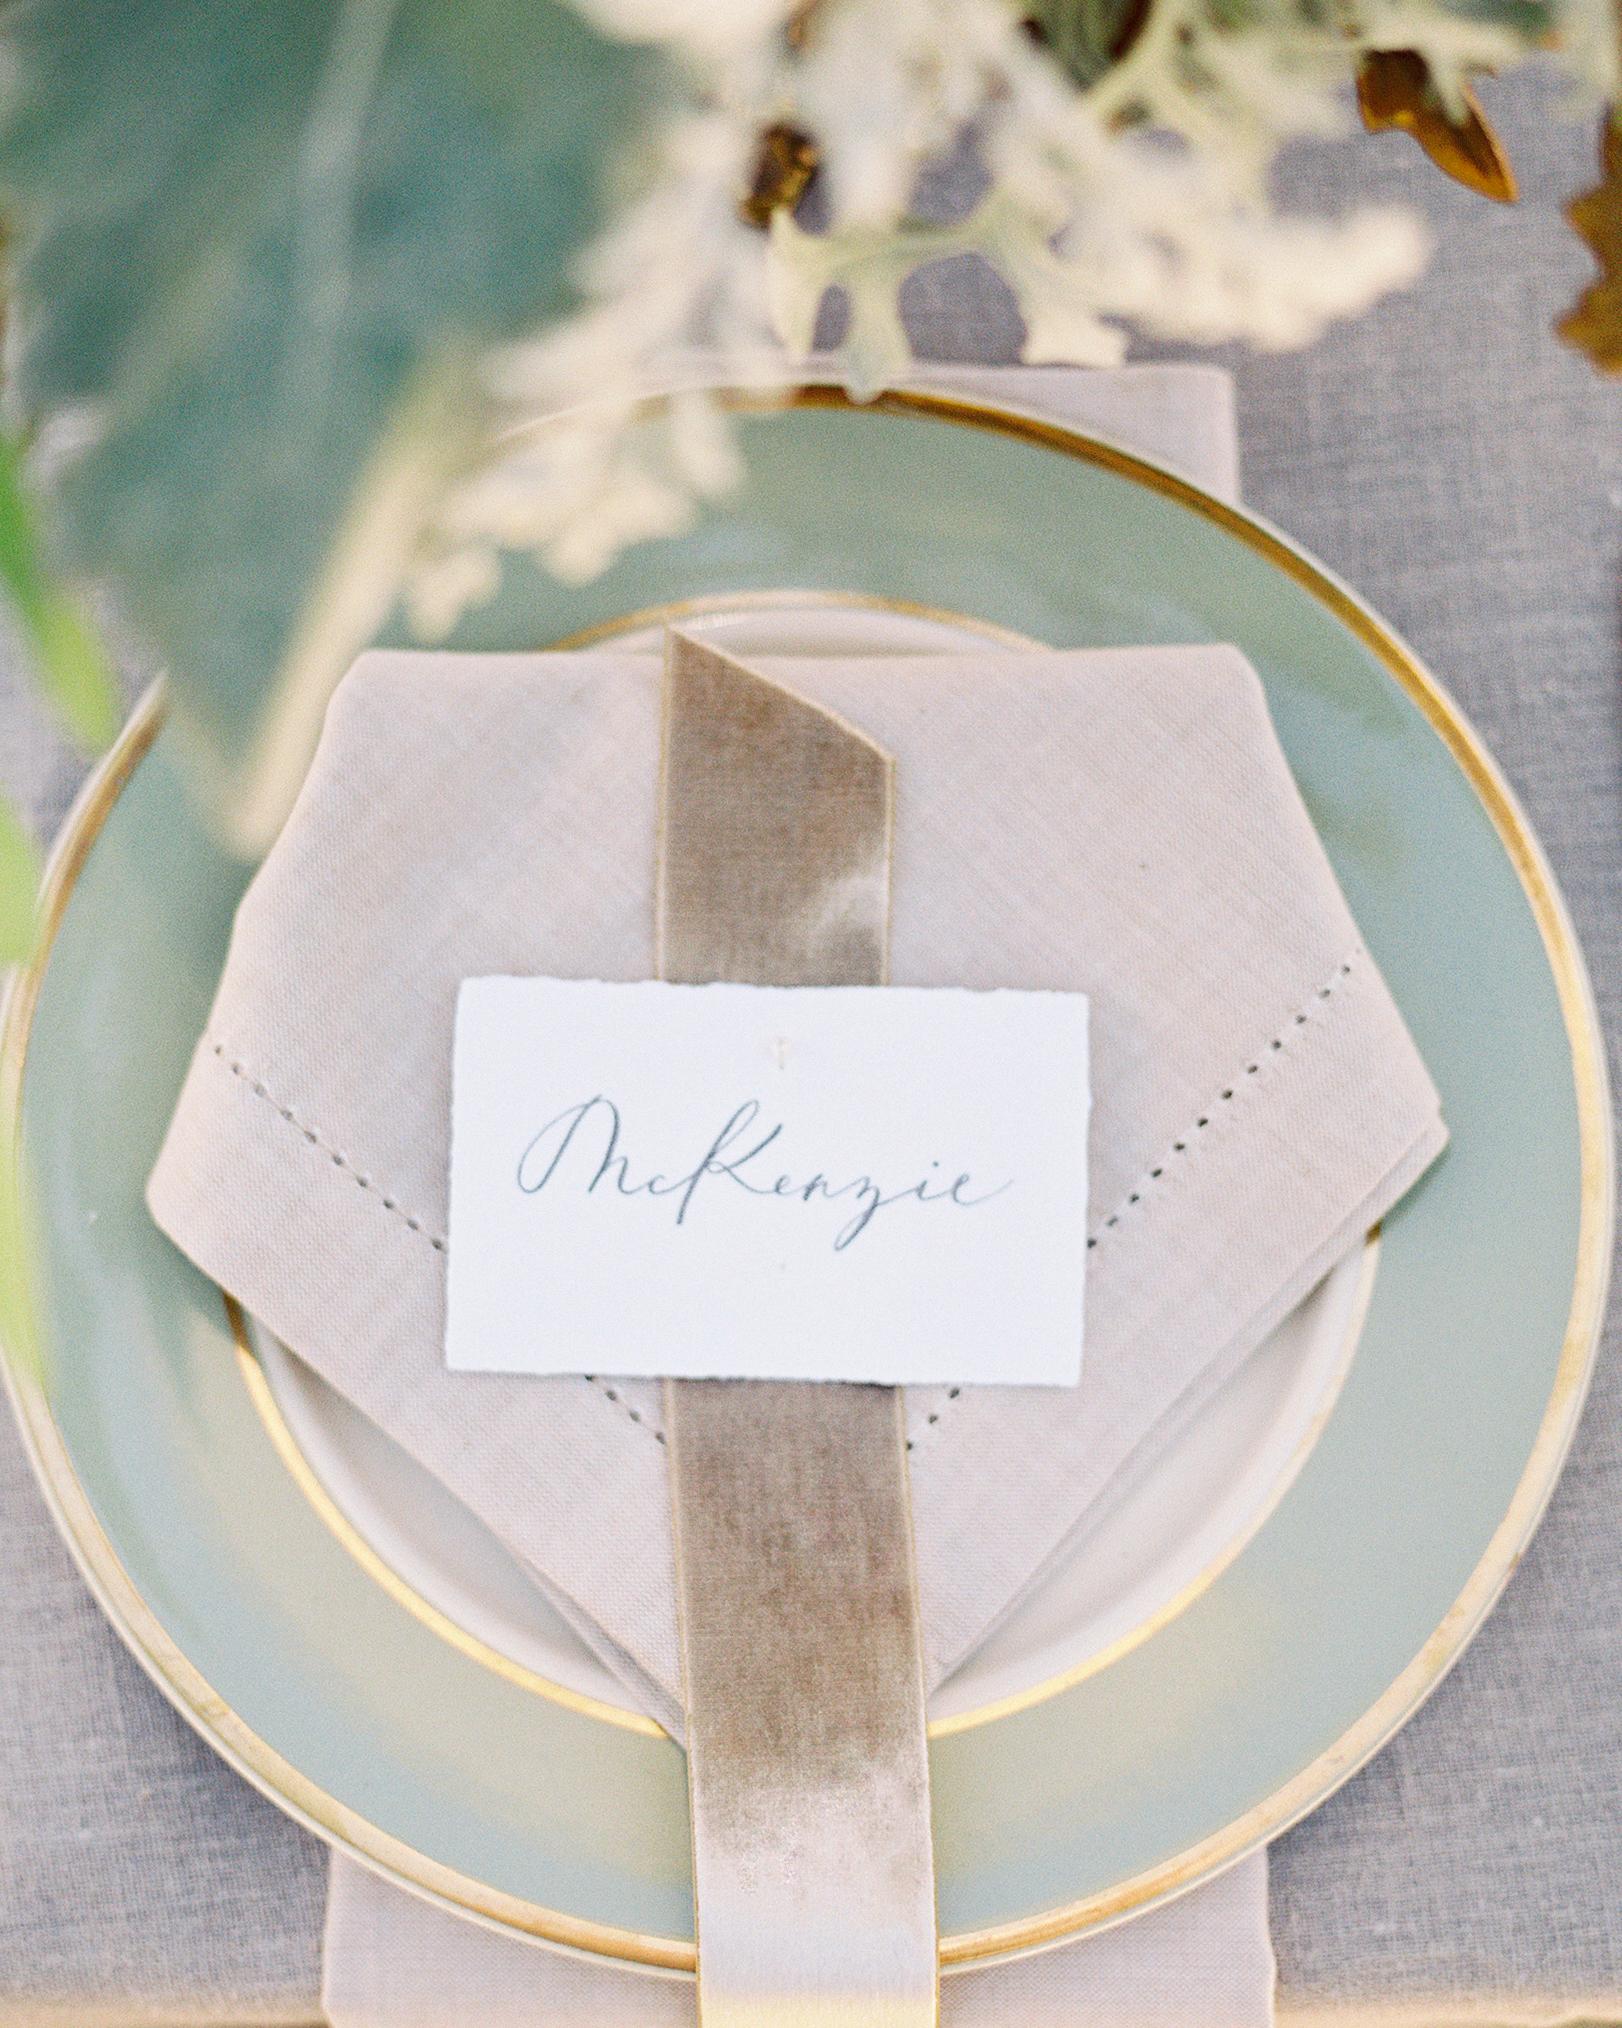 mckenzie-brandon-wedding-placesetting-78-s112364-1115.jpg